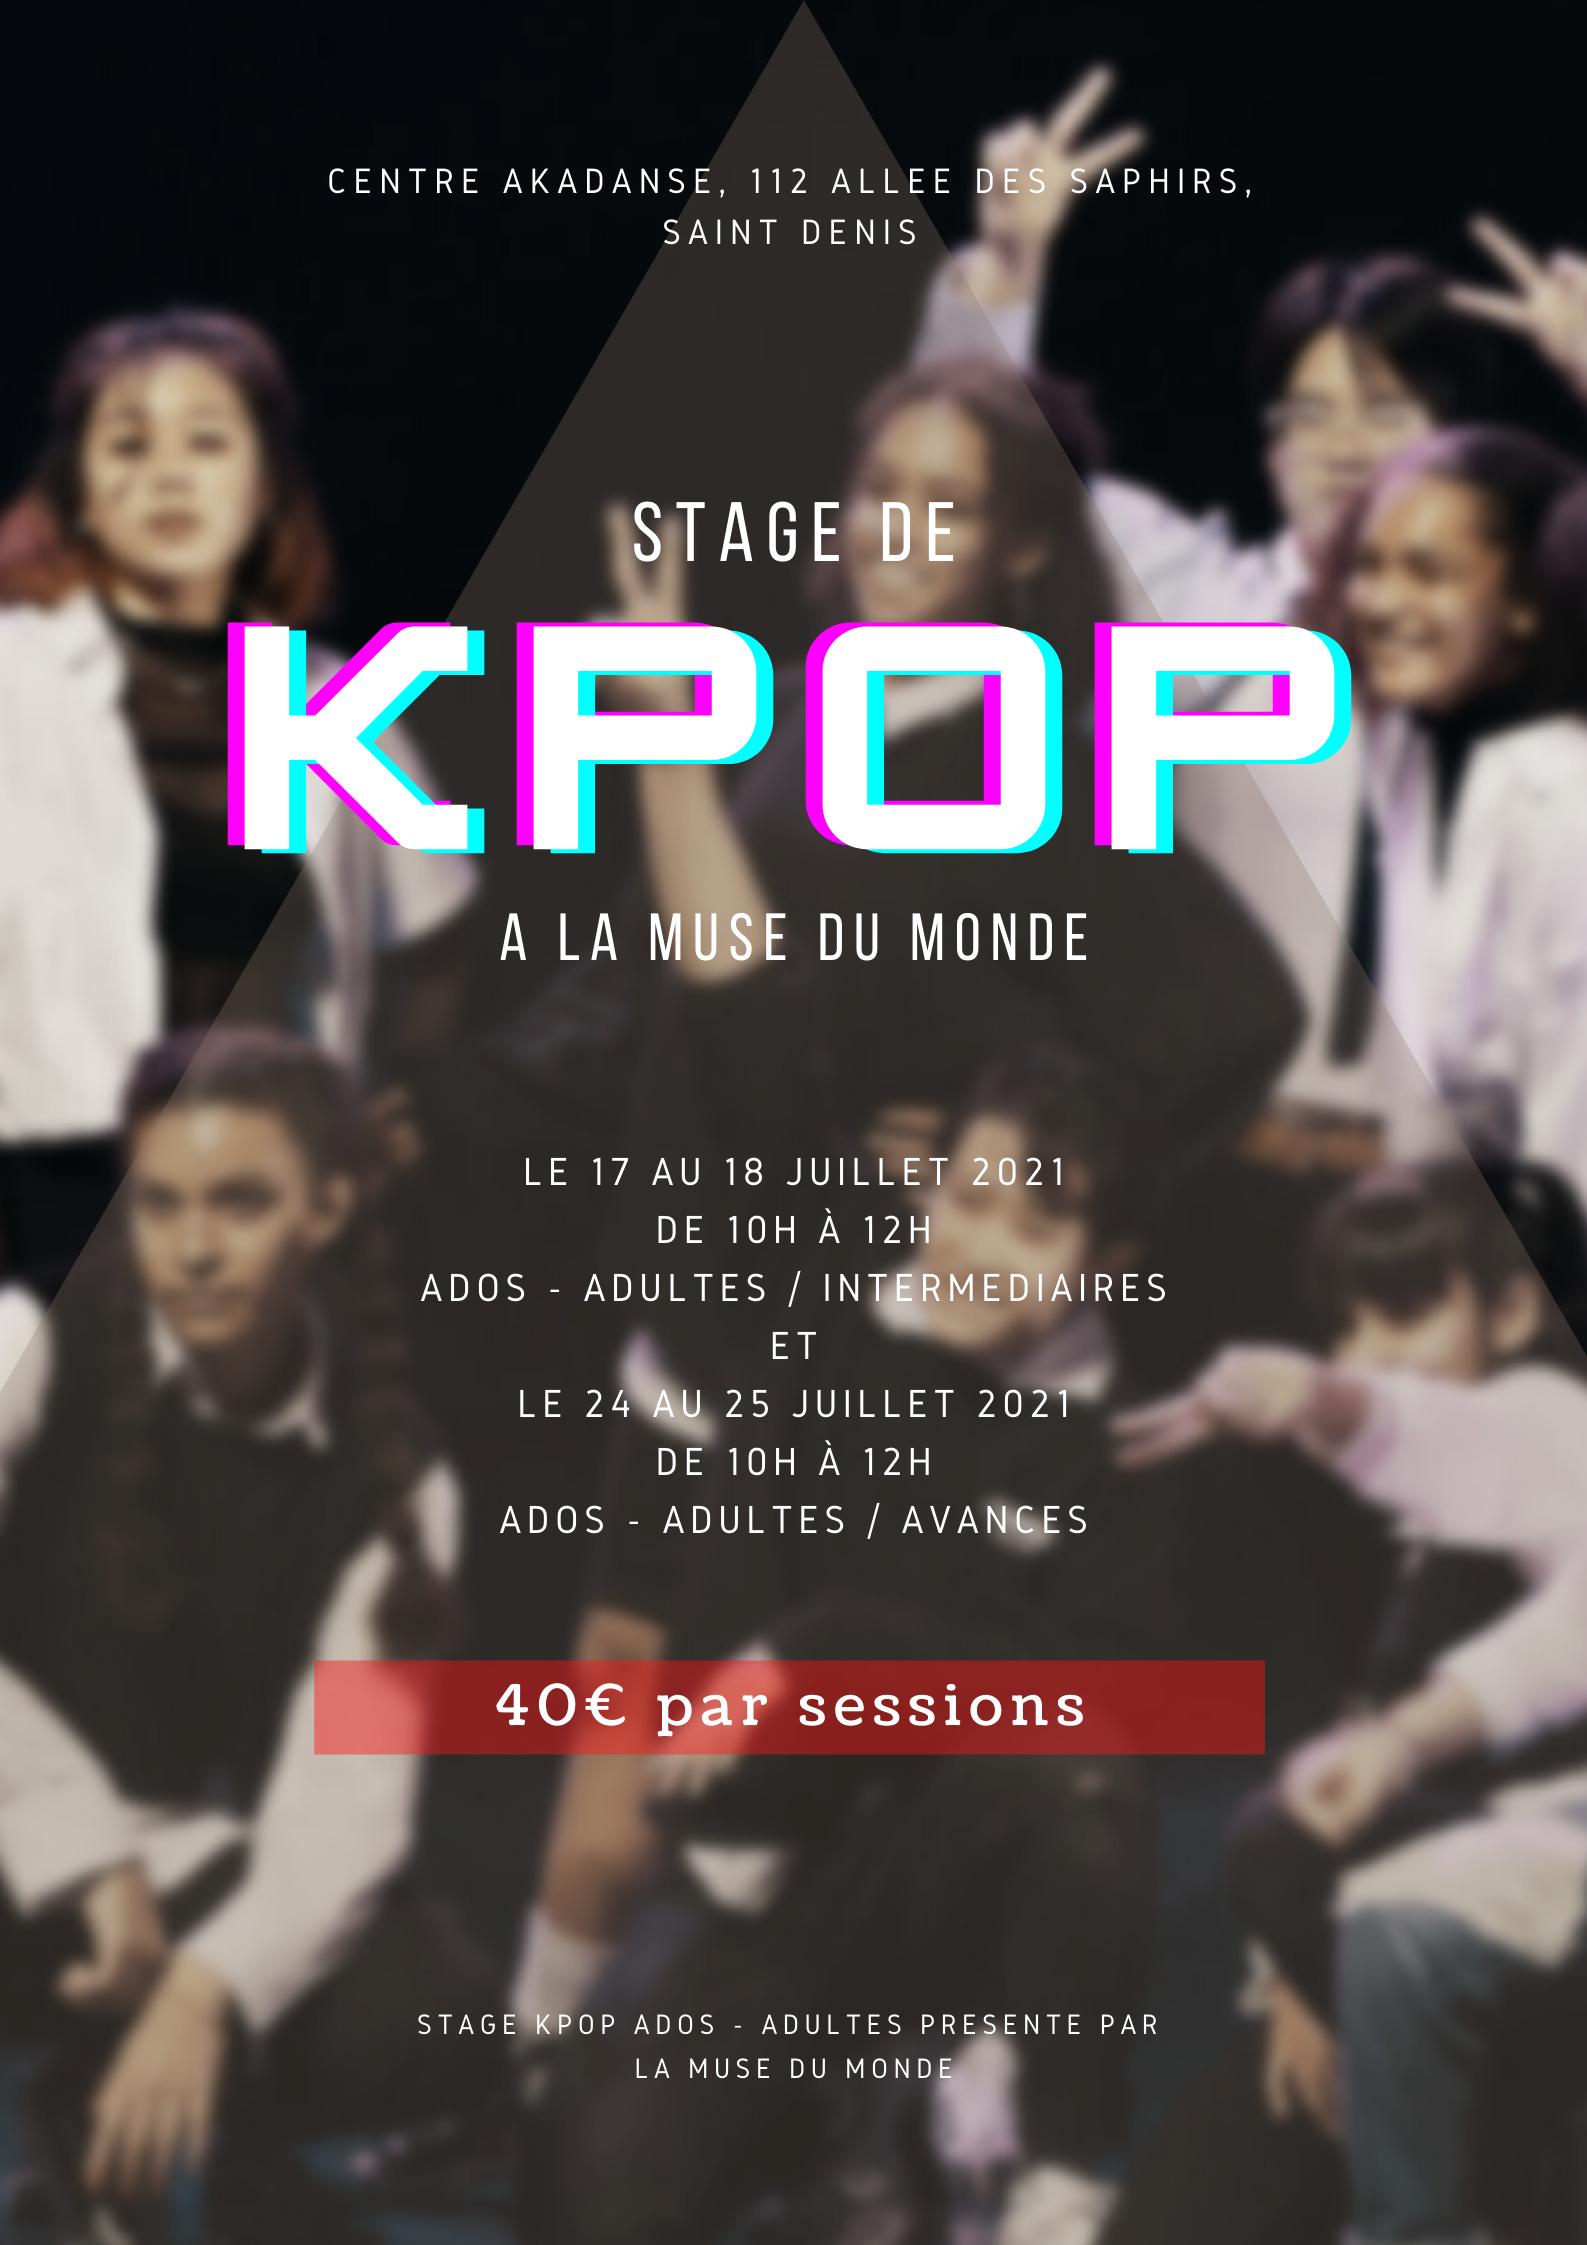 Stage kpop (Avancés)